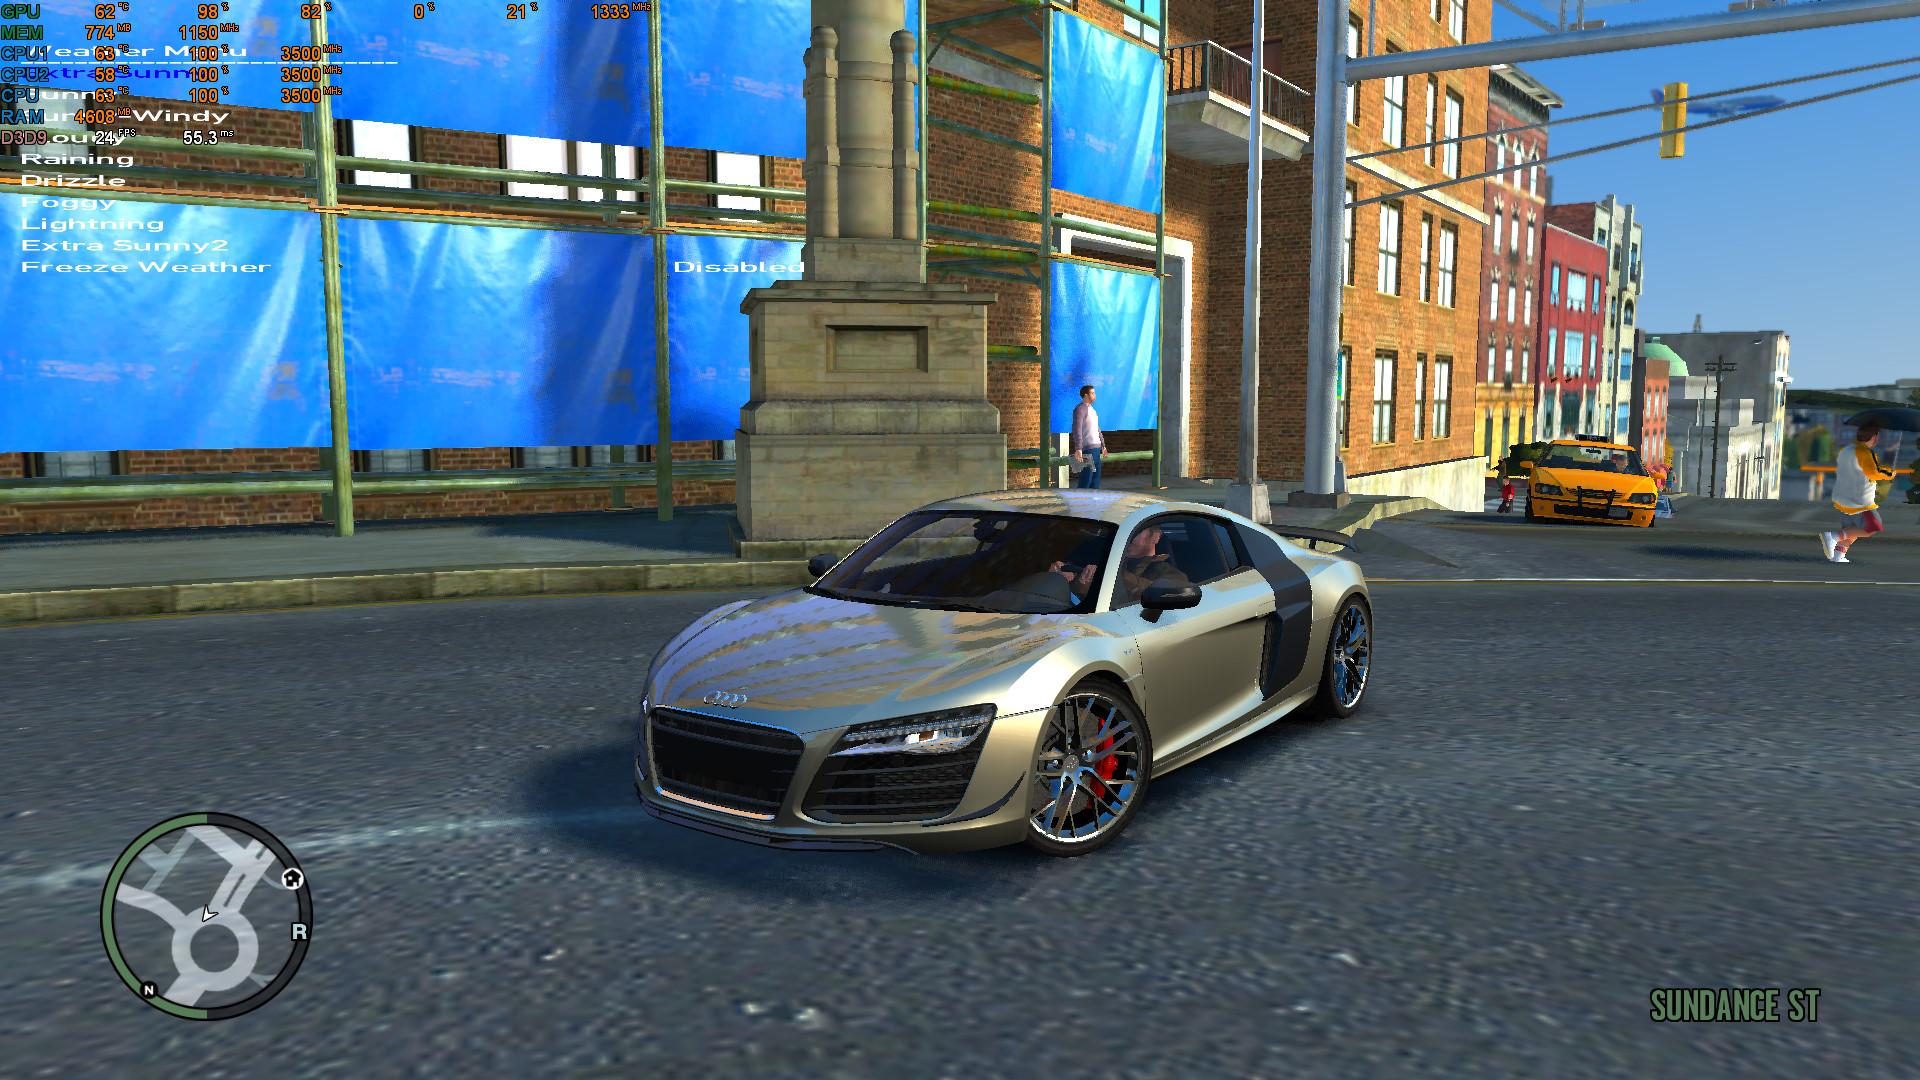 Gta 4 mods free download pc